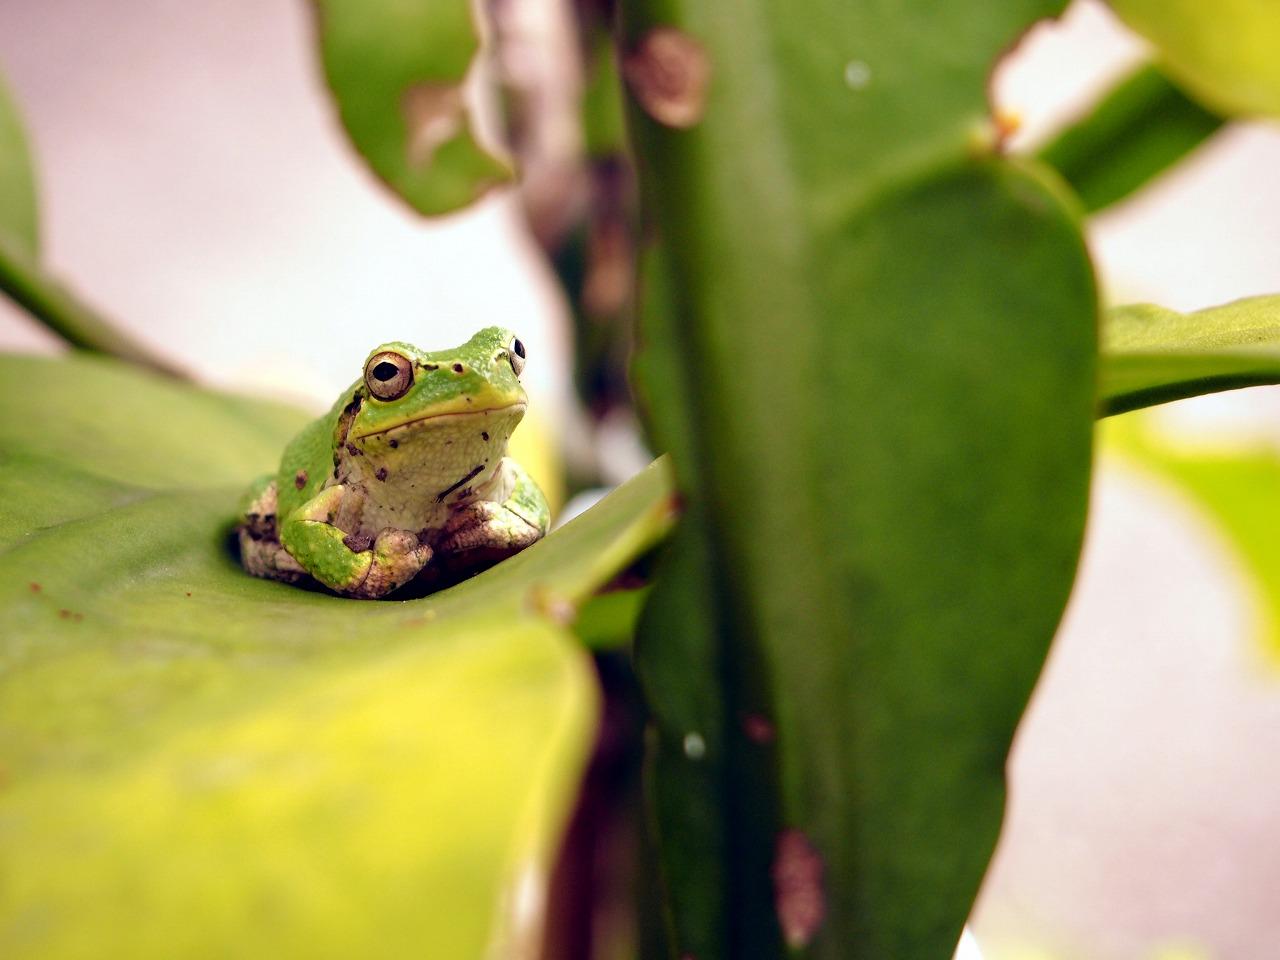 Frog_20140802-05.jpg